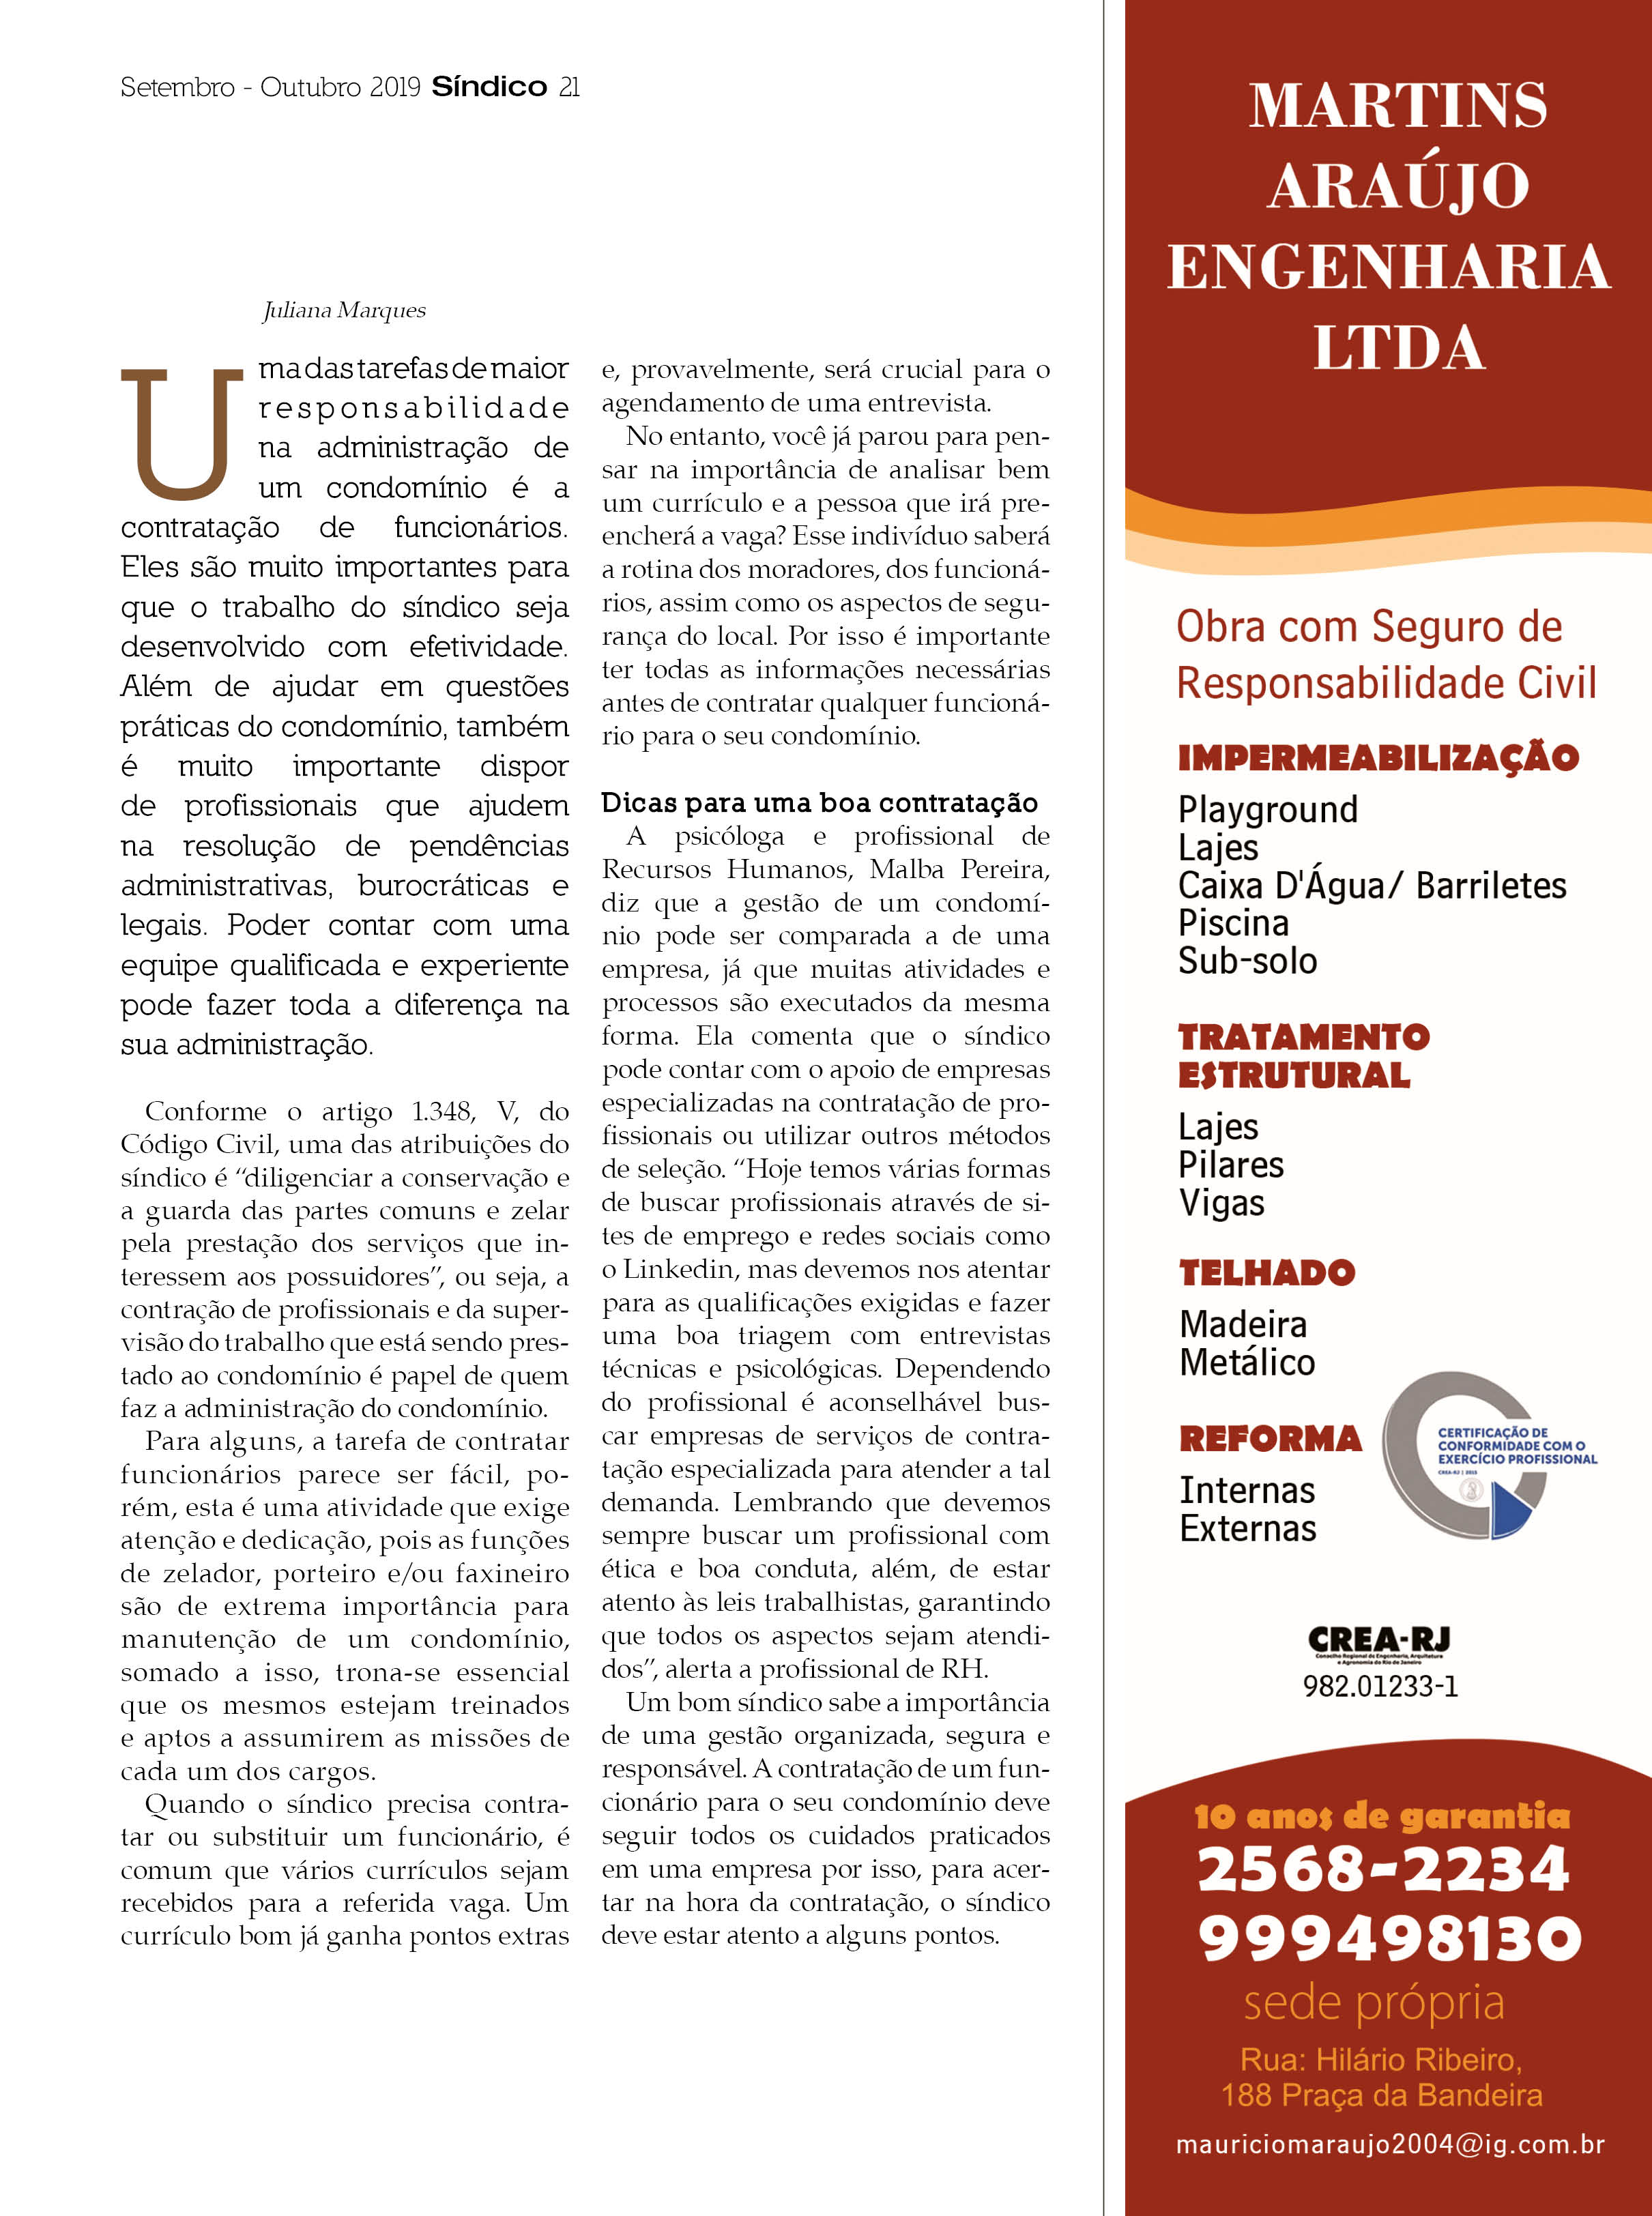 Revista Síndico_ed 246_19